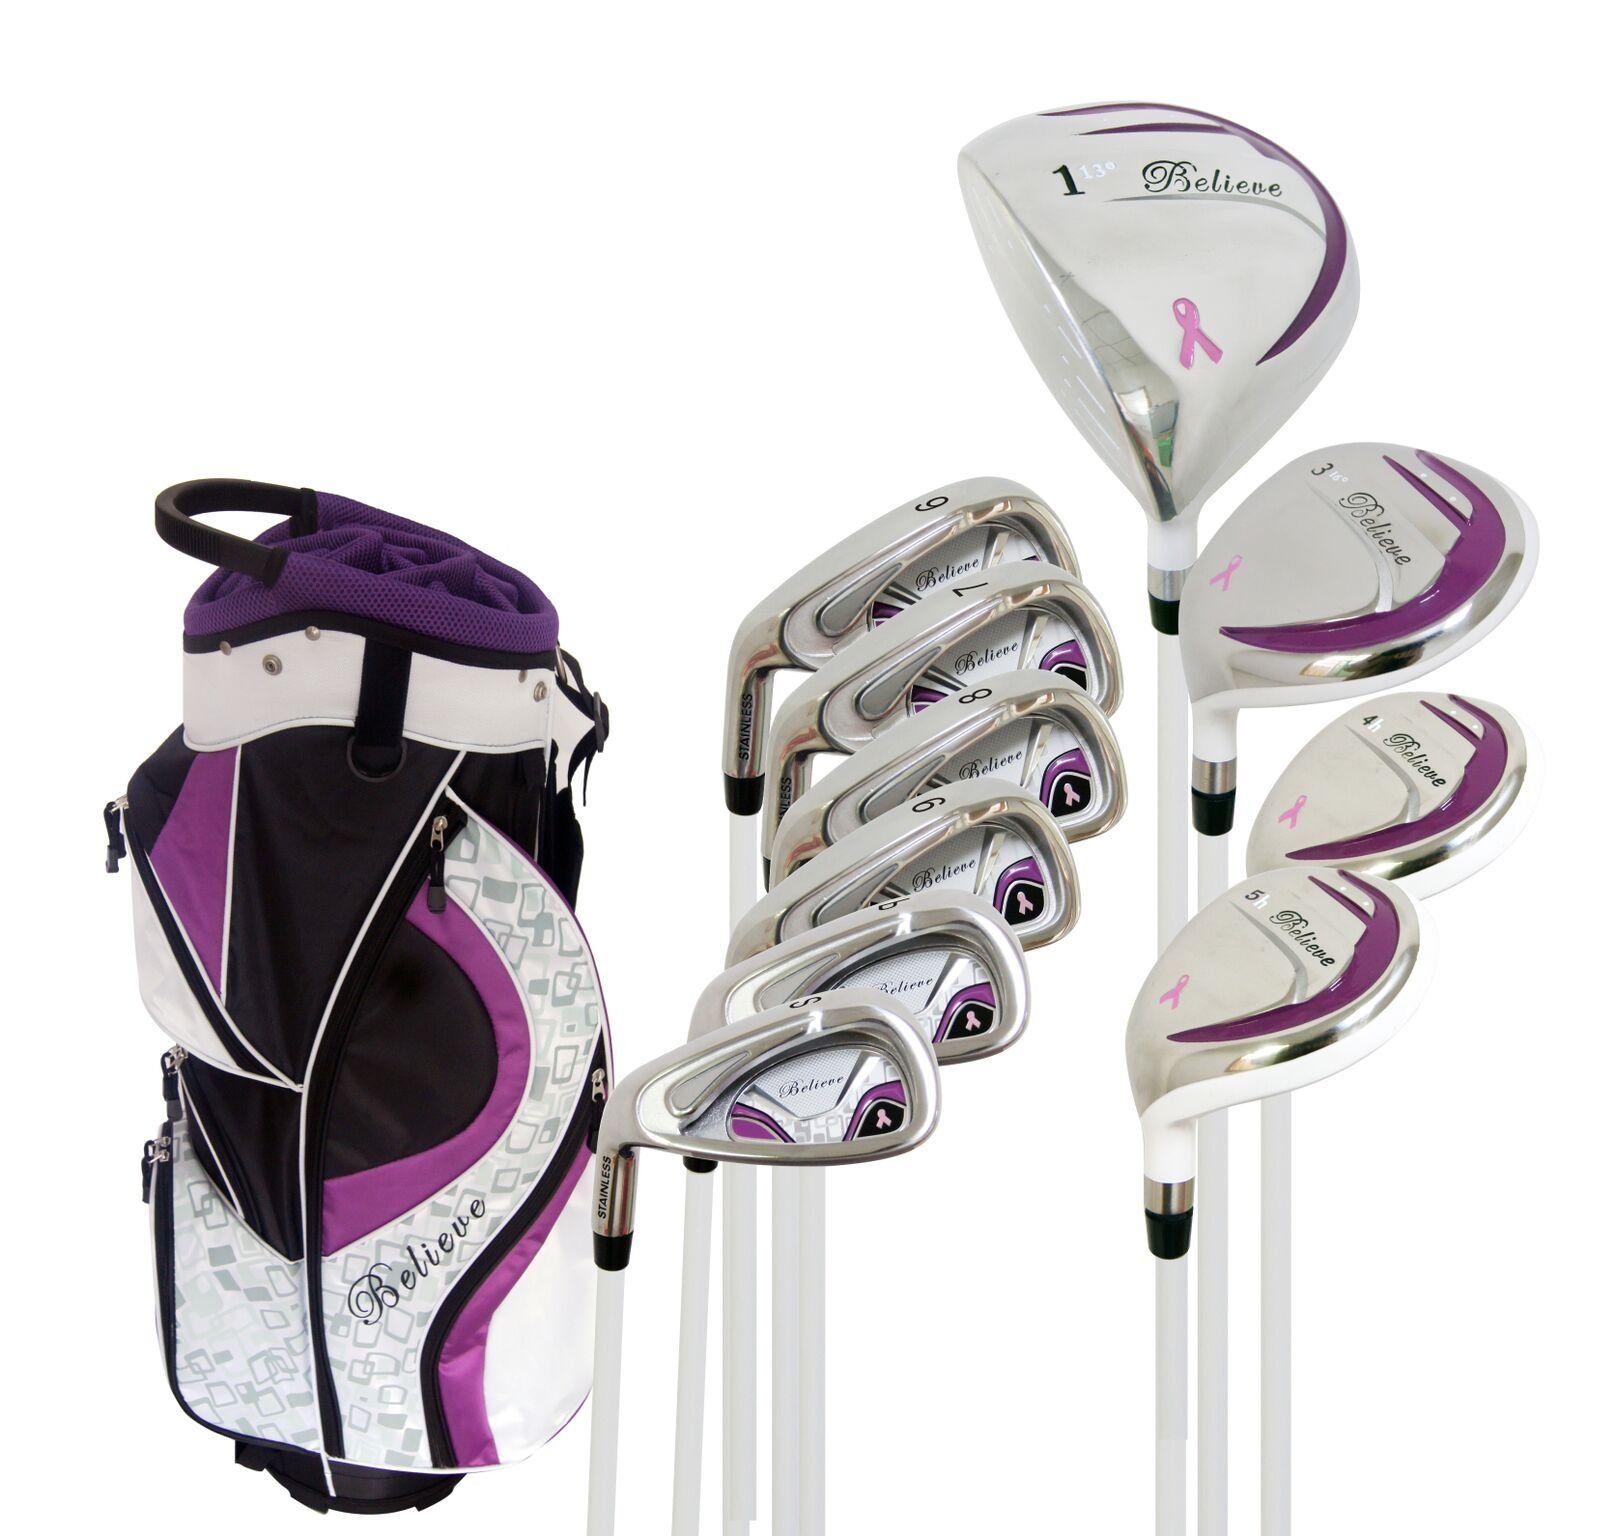 Golf clubs believe founders club ladies complete golf